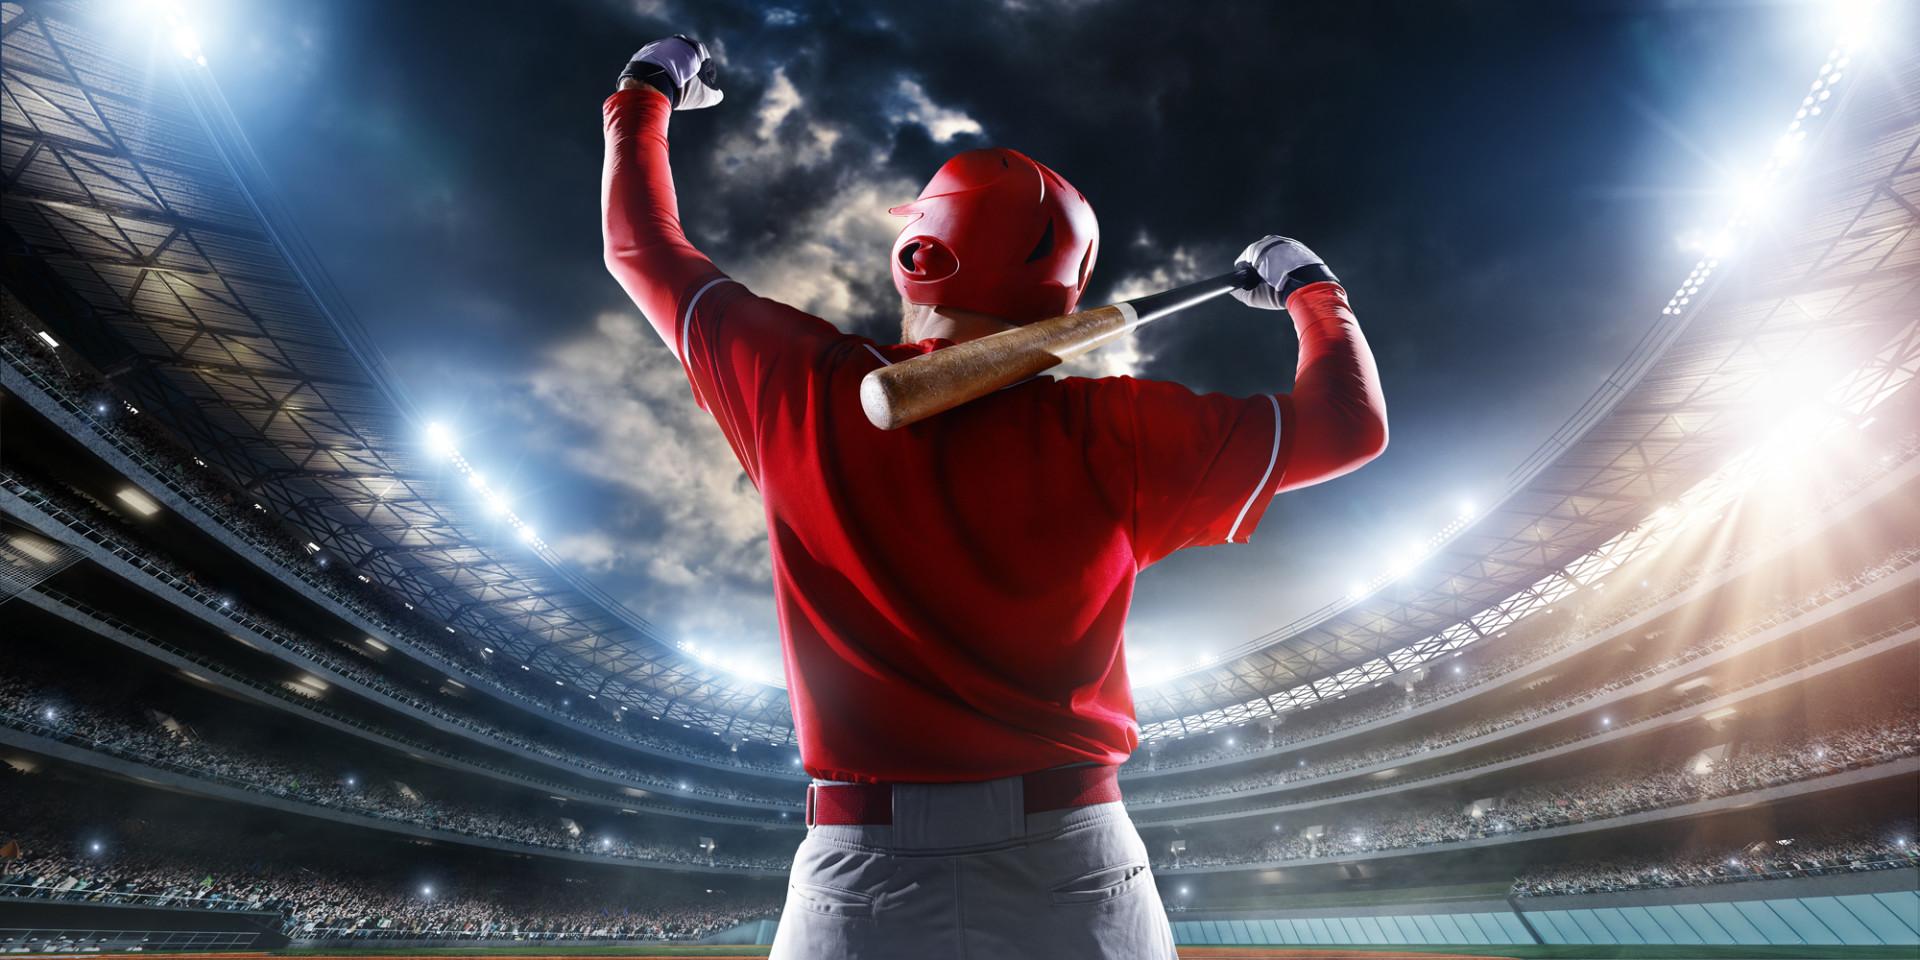 23_03_2016_baseball_game_10_2-1920x960